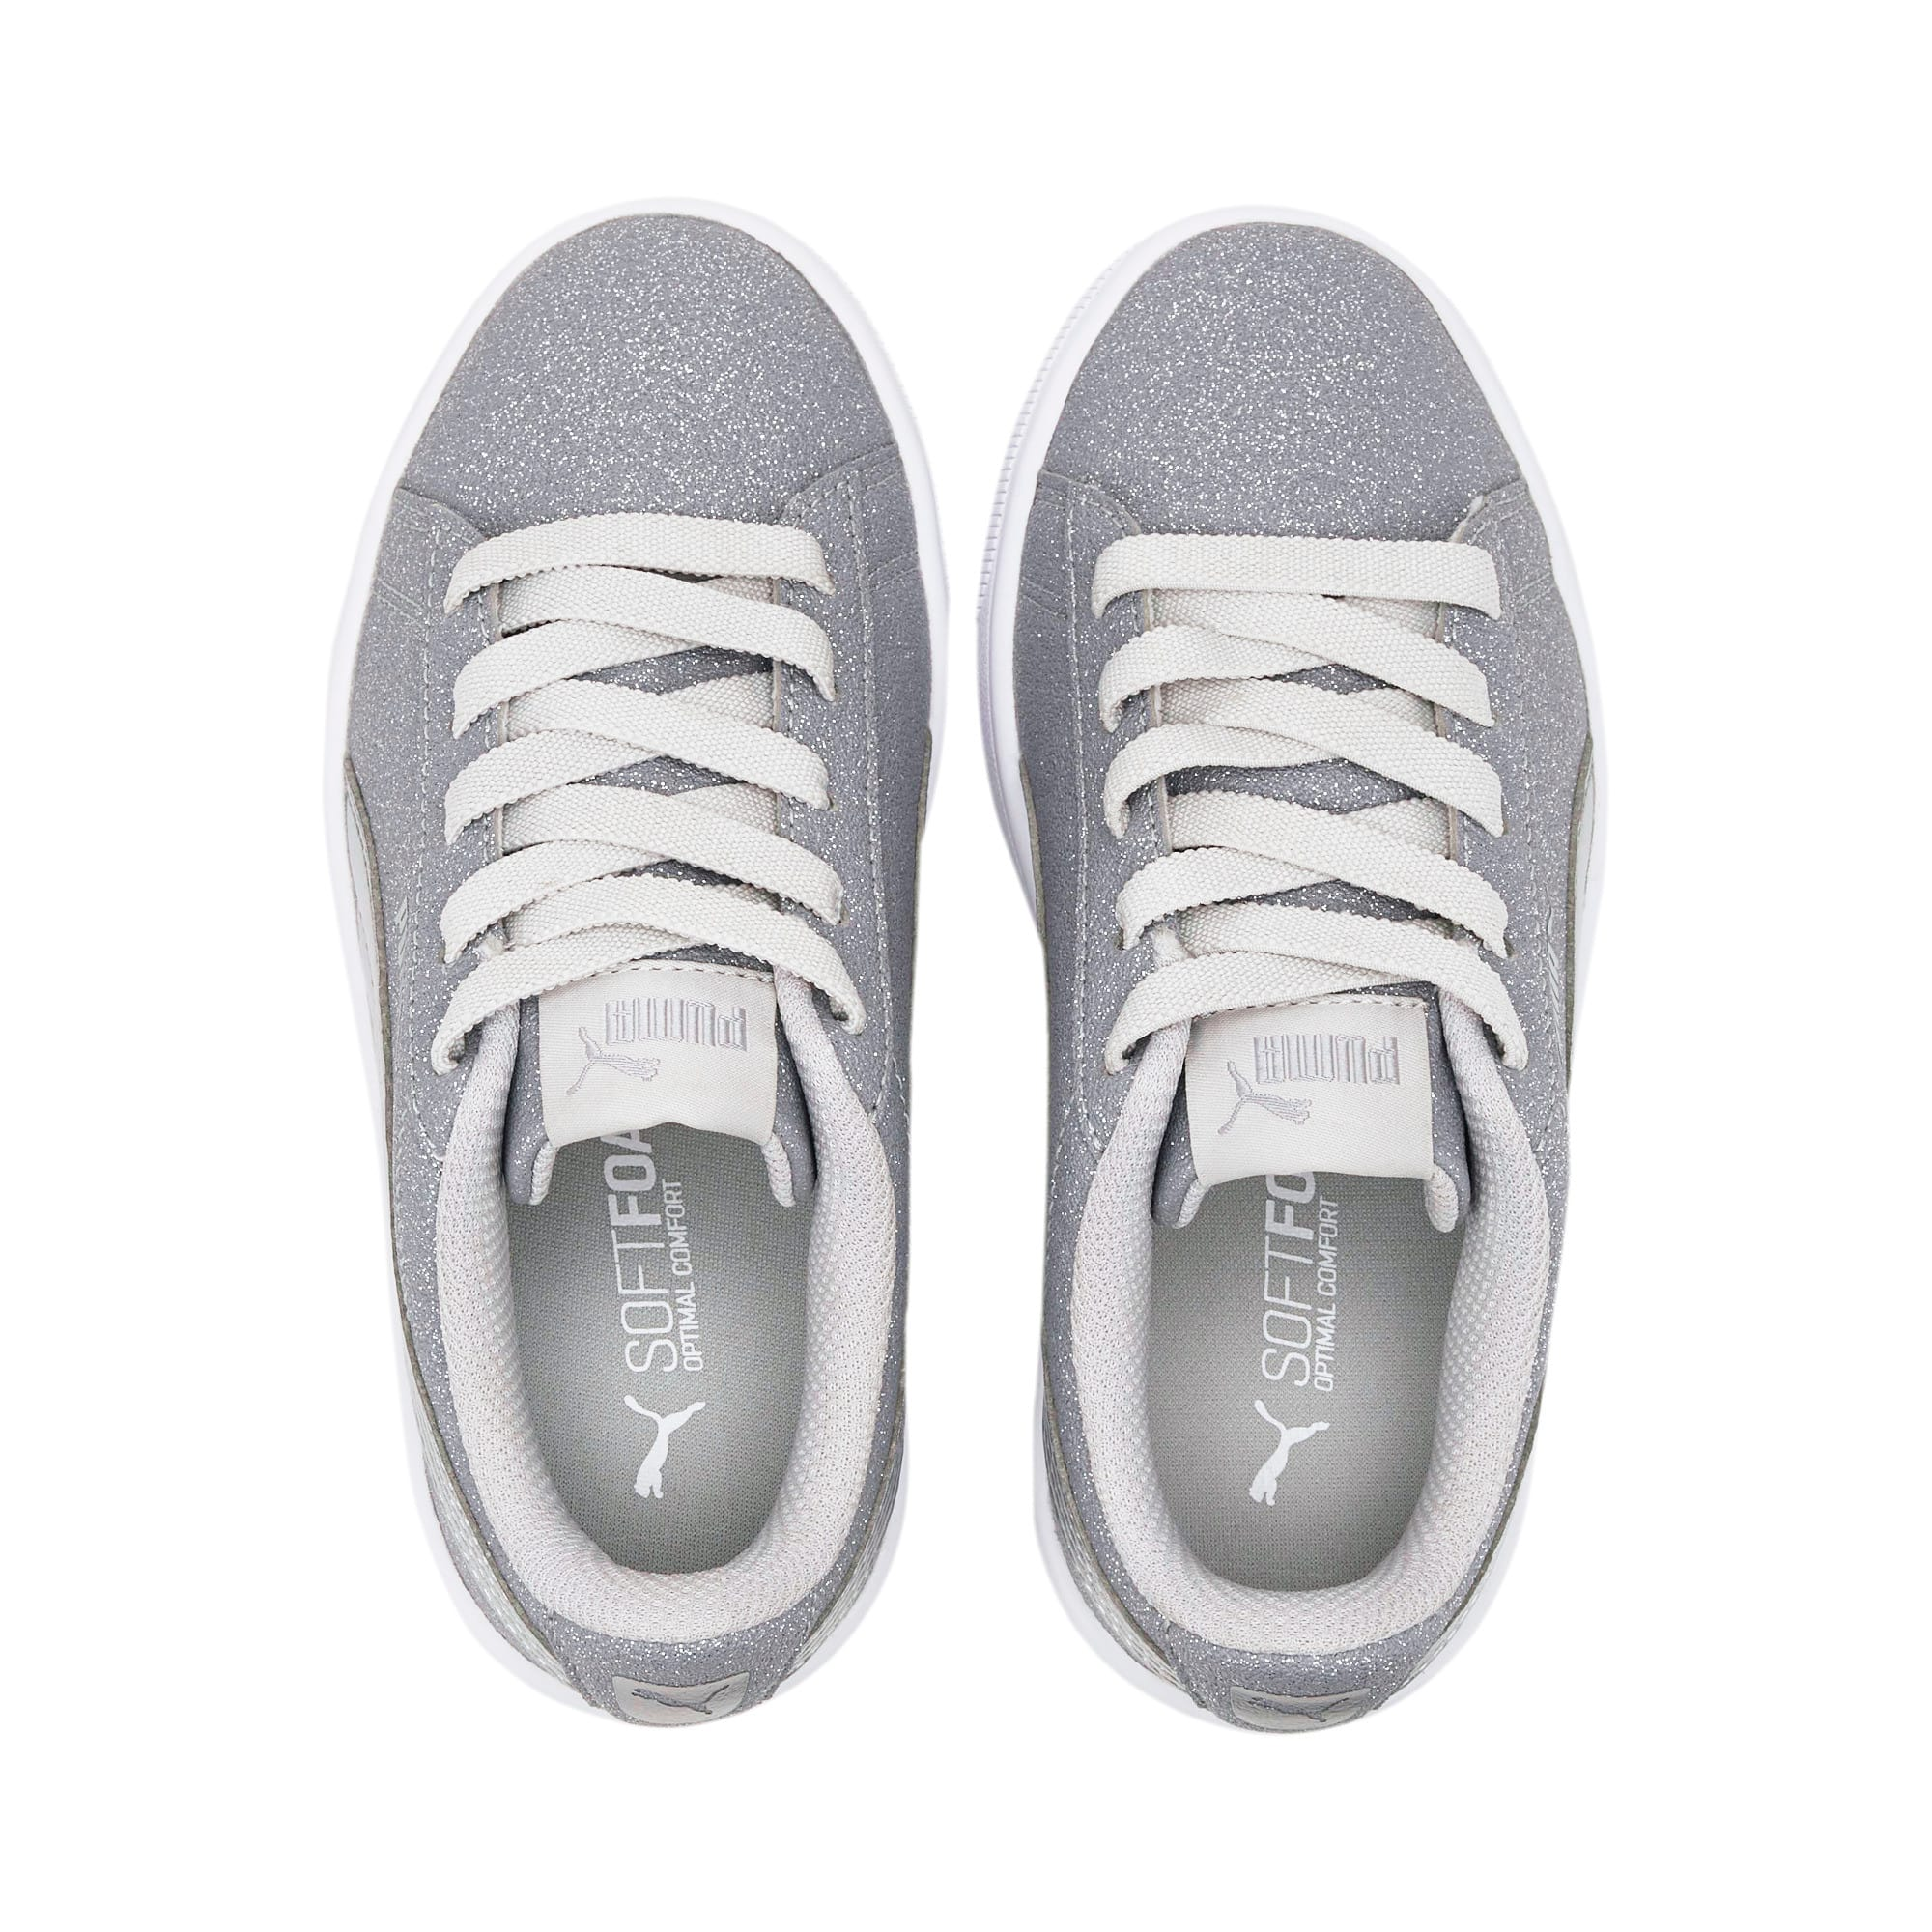 Thumbnail 6 of PUMA Vikky v2 Glitz AC Sneakers PS, Gray Violet-Silver-White, medium